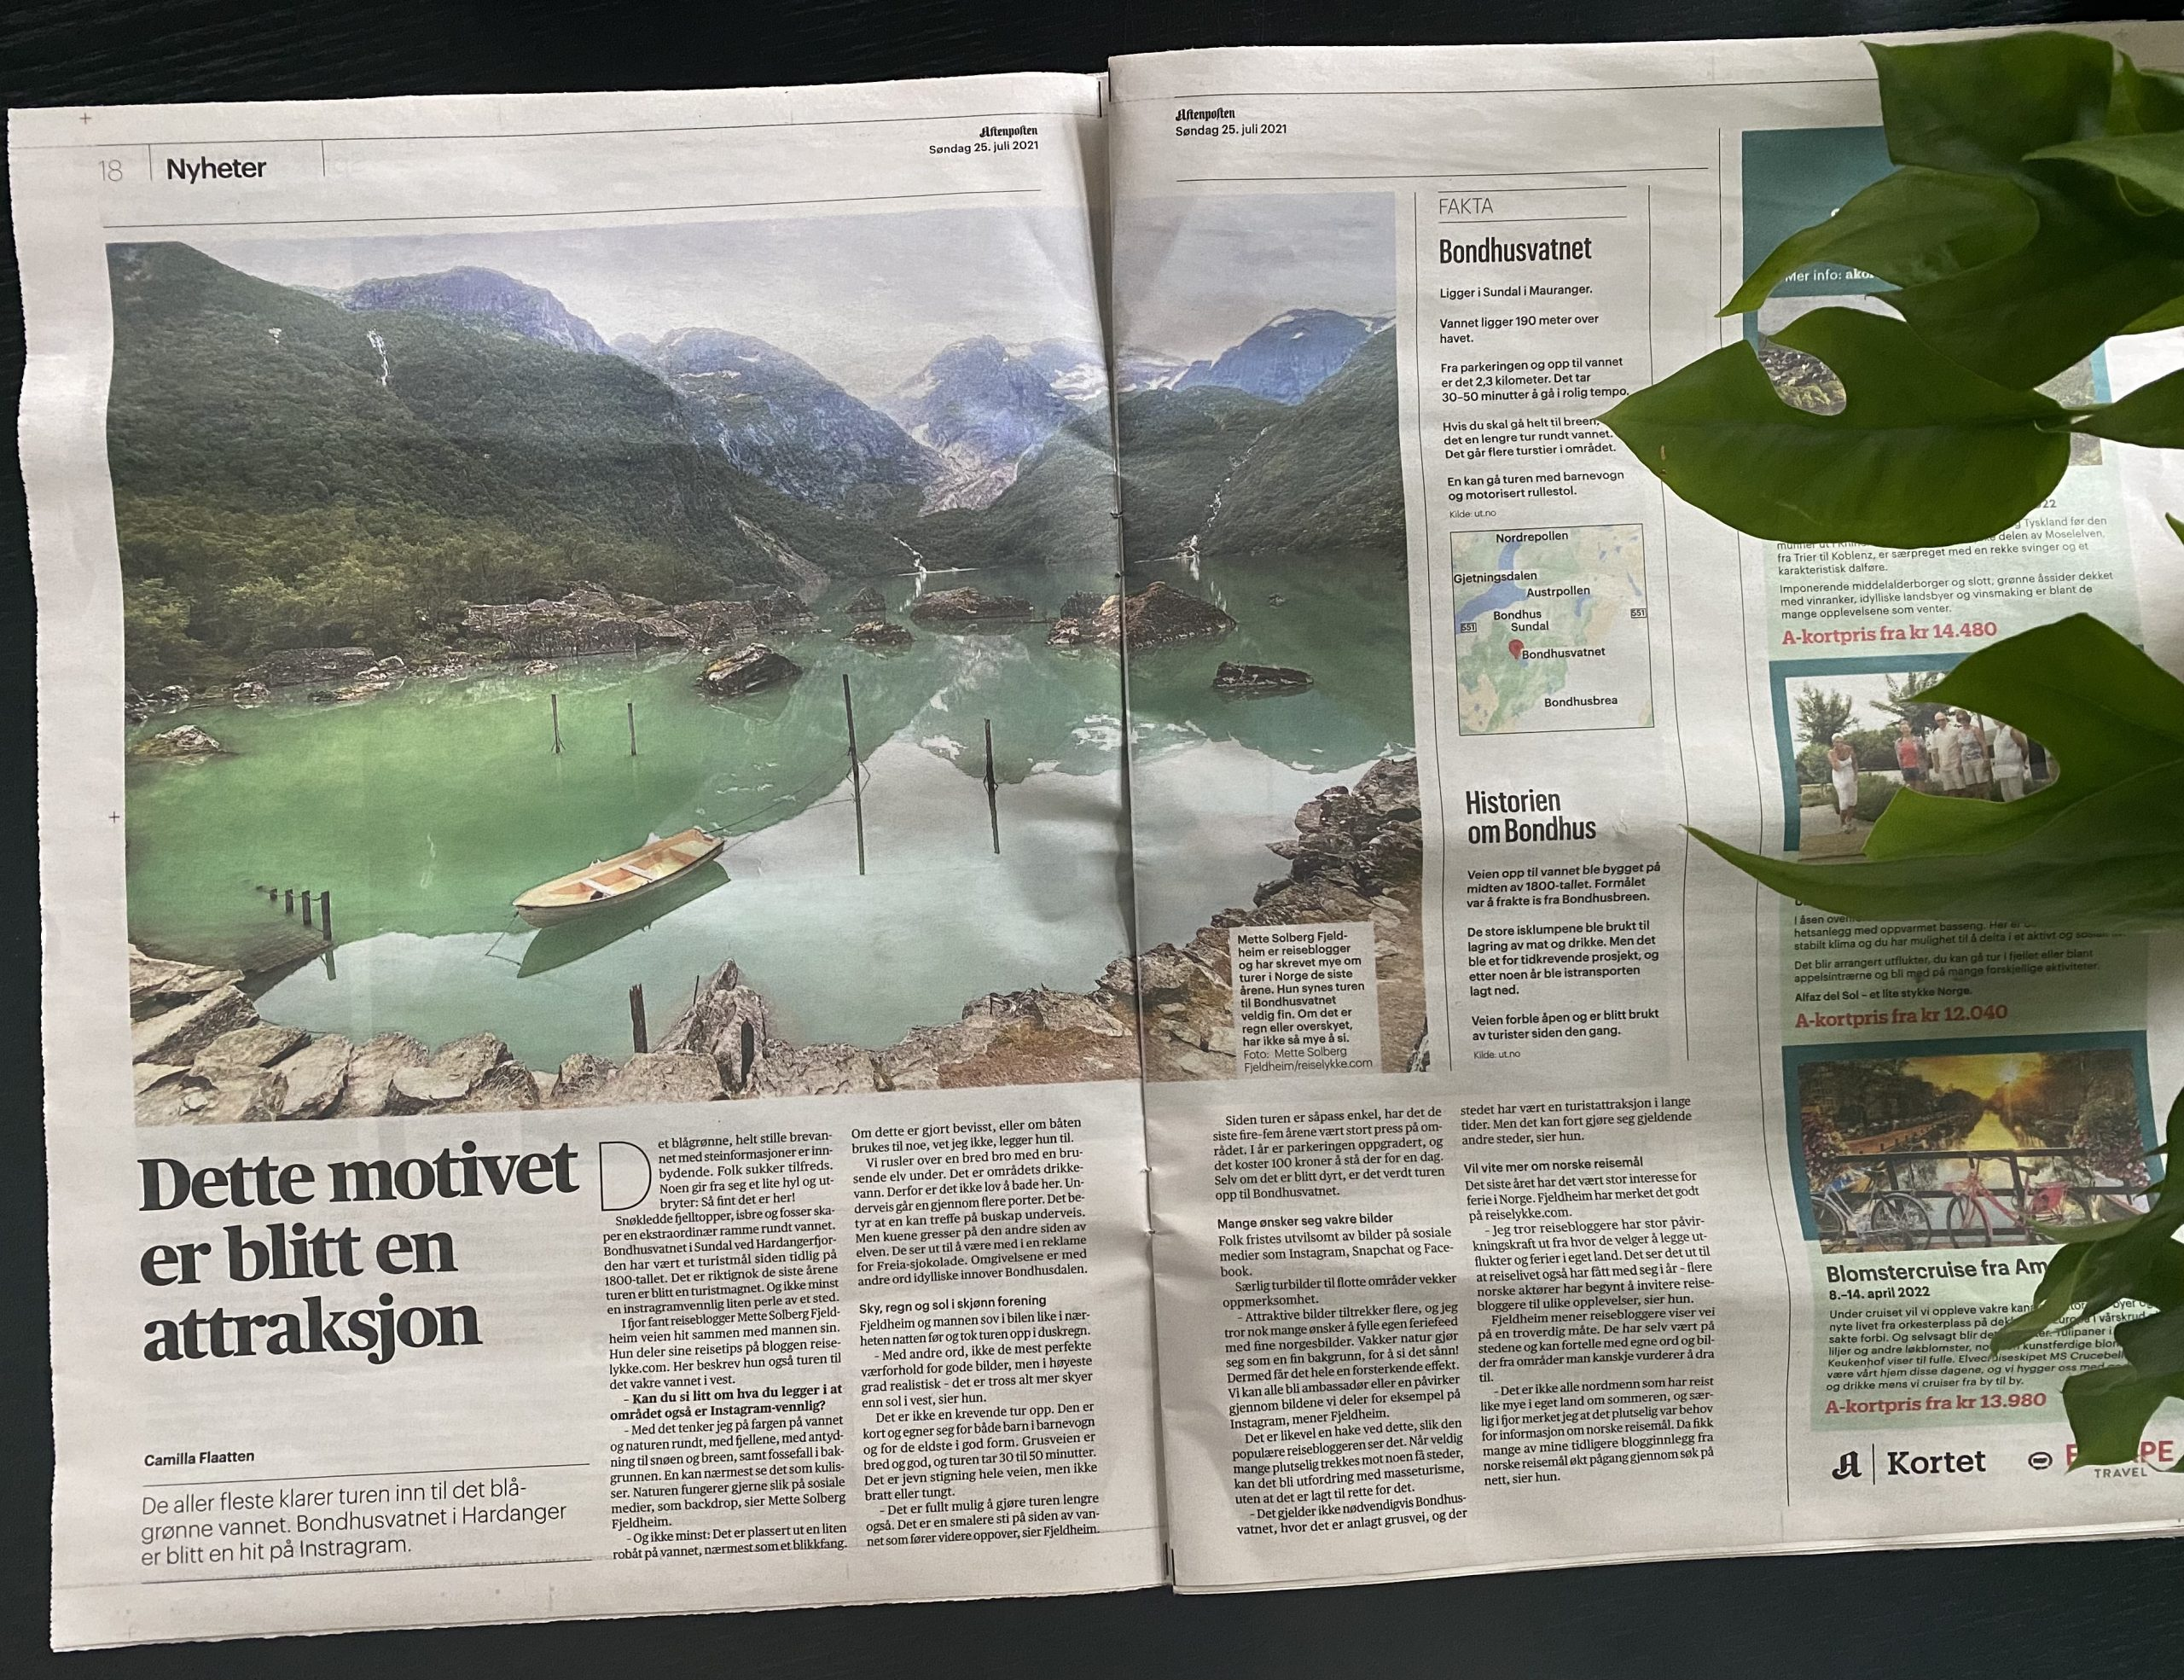 Reiselykke i Aftenposten. Mette S. Fjeldheim intervjuet om Bondhusvatnet